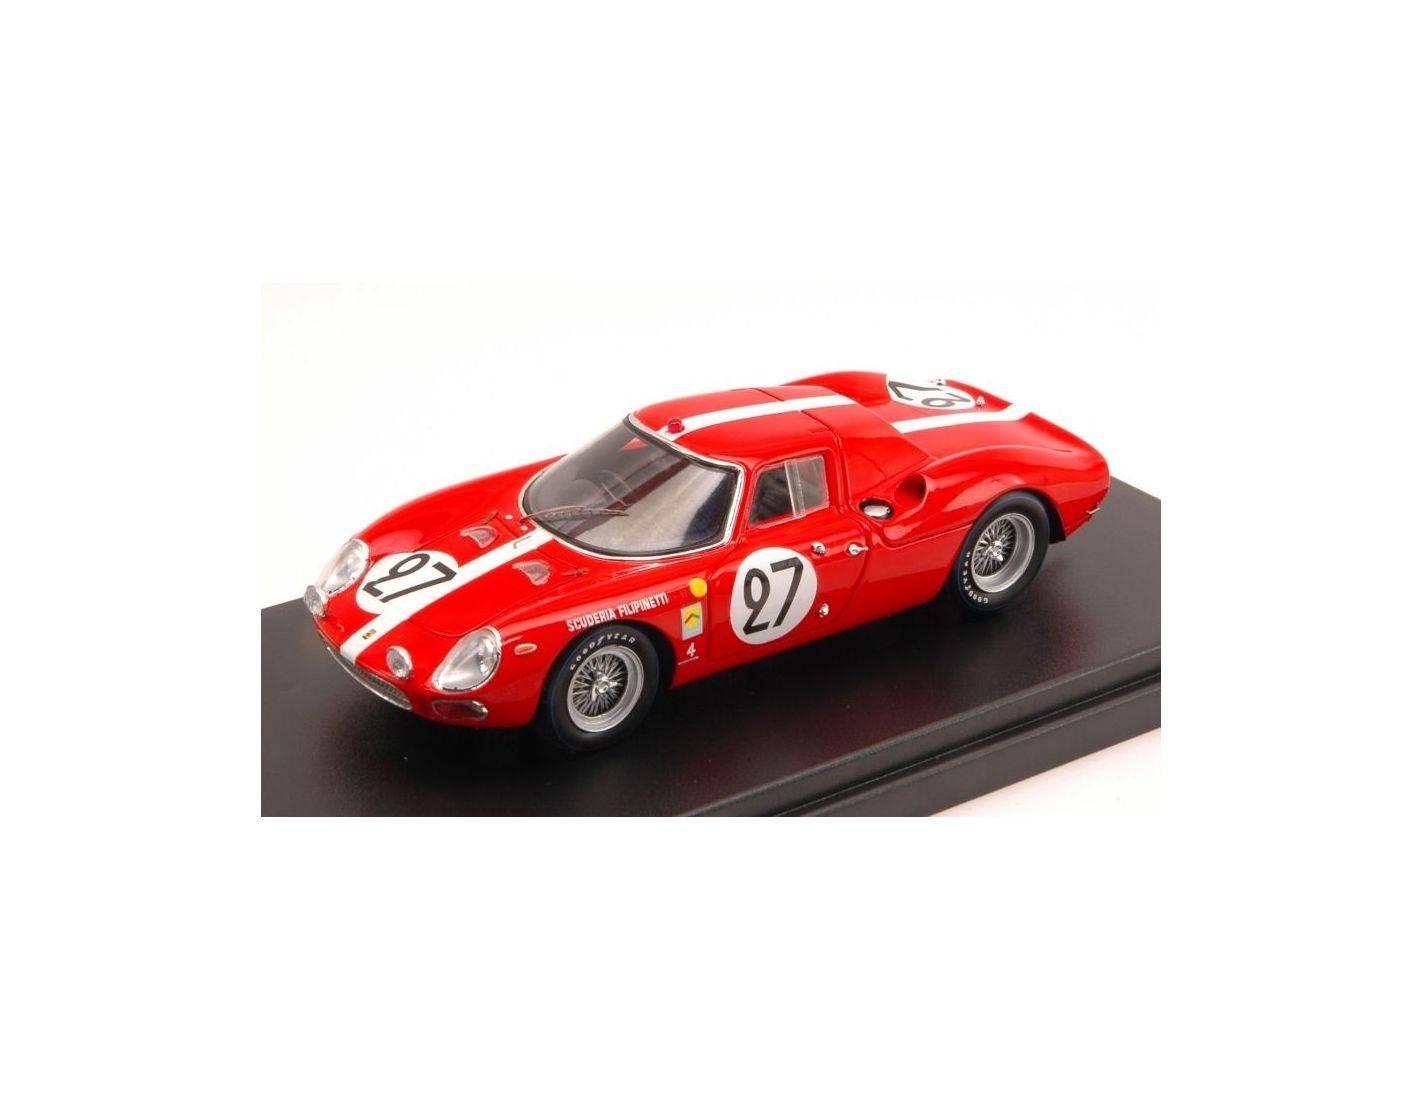 Looksmart Lslm018 Ferrari 250 Lm N 27 6th Lm 1965 D